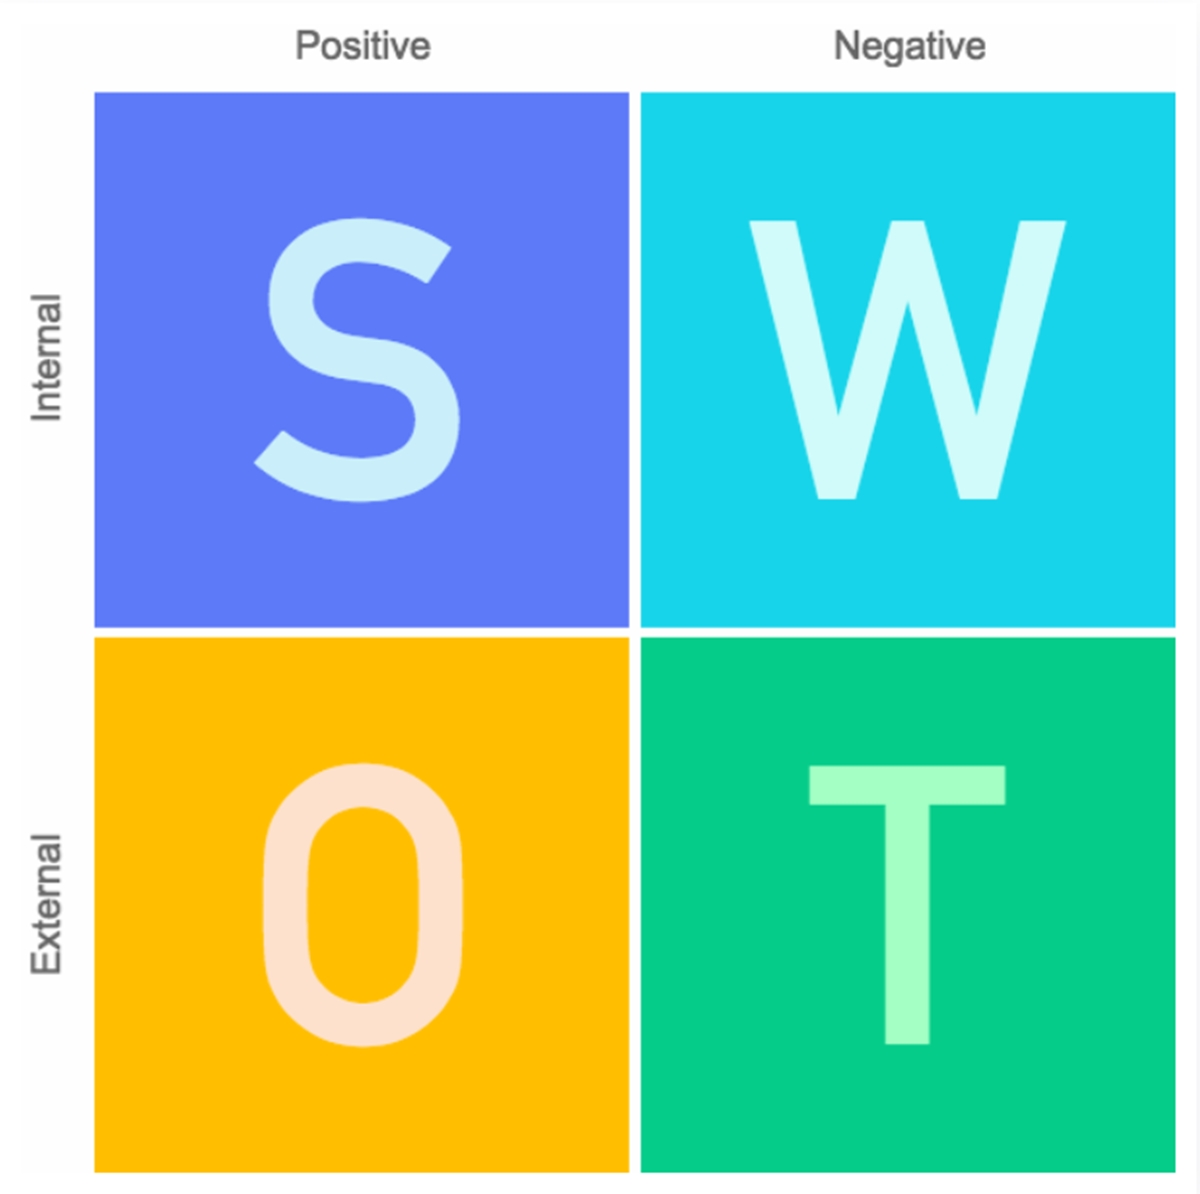 The SWOT analysis matrix